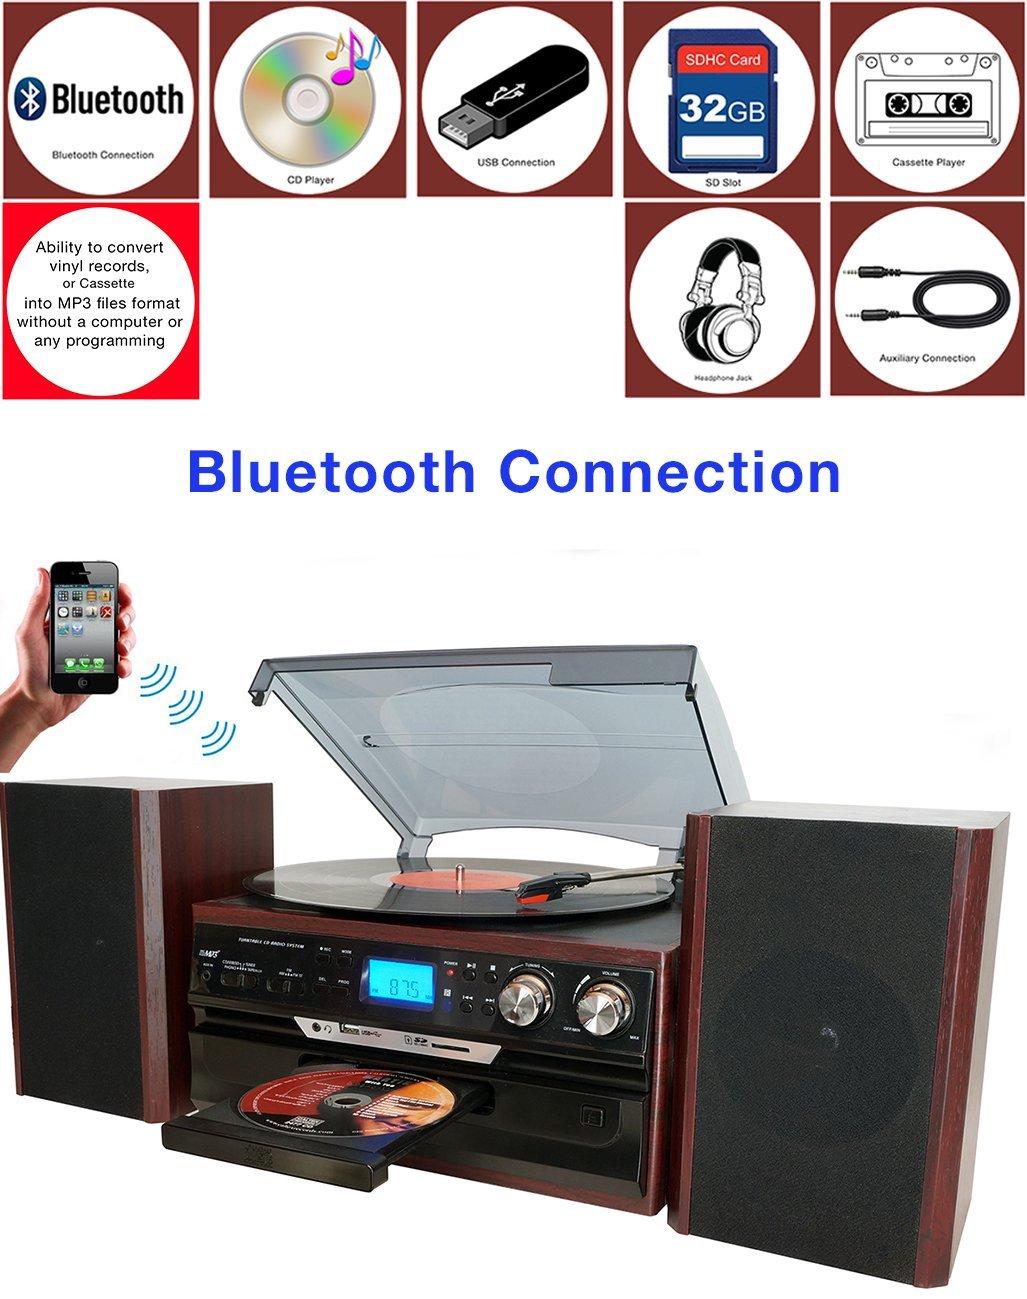 Electronic Palace: Boytone BT-24DJM Turntable Bluetooth CD